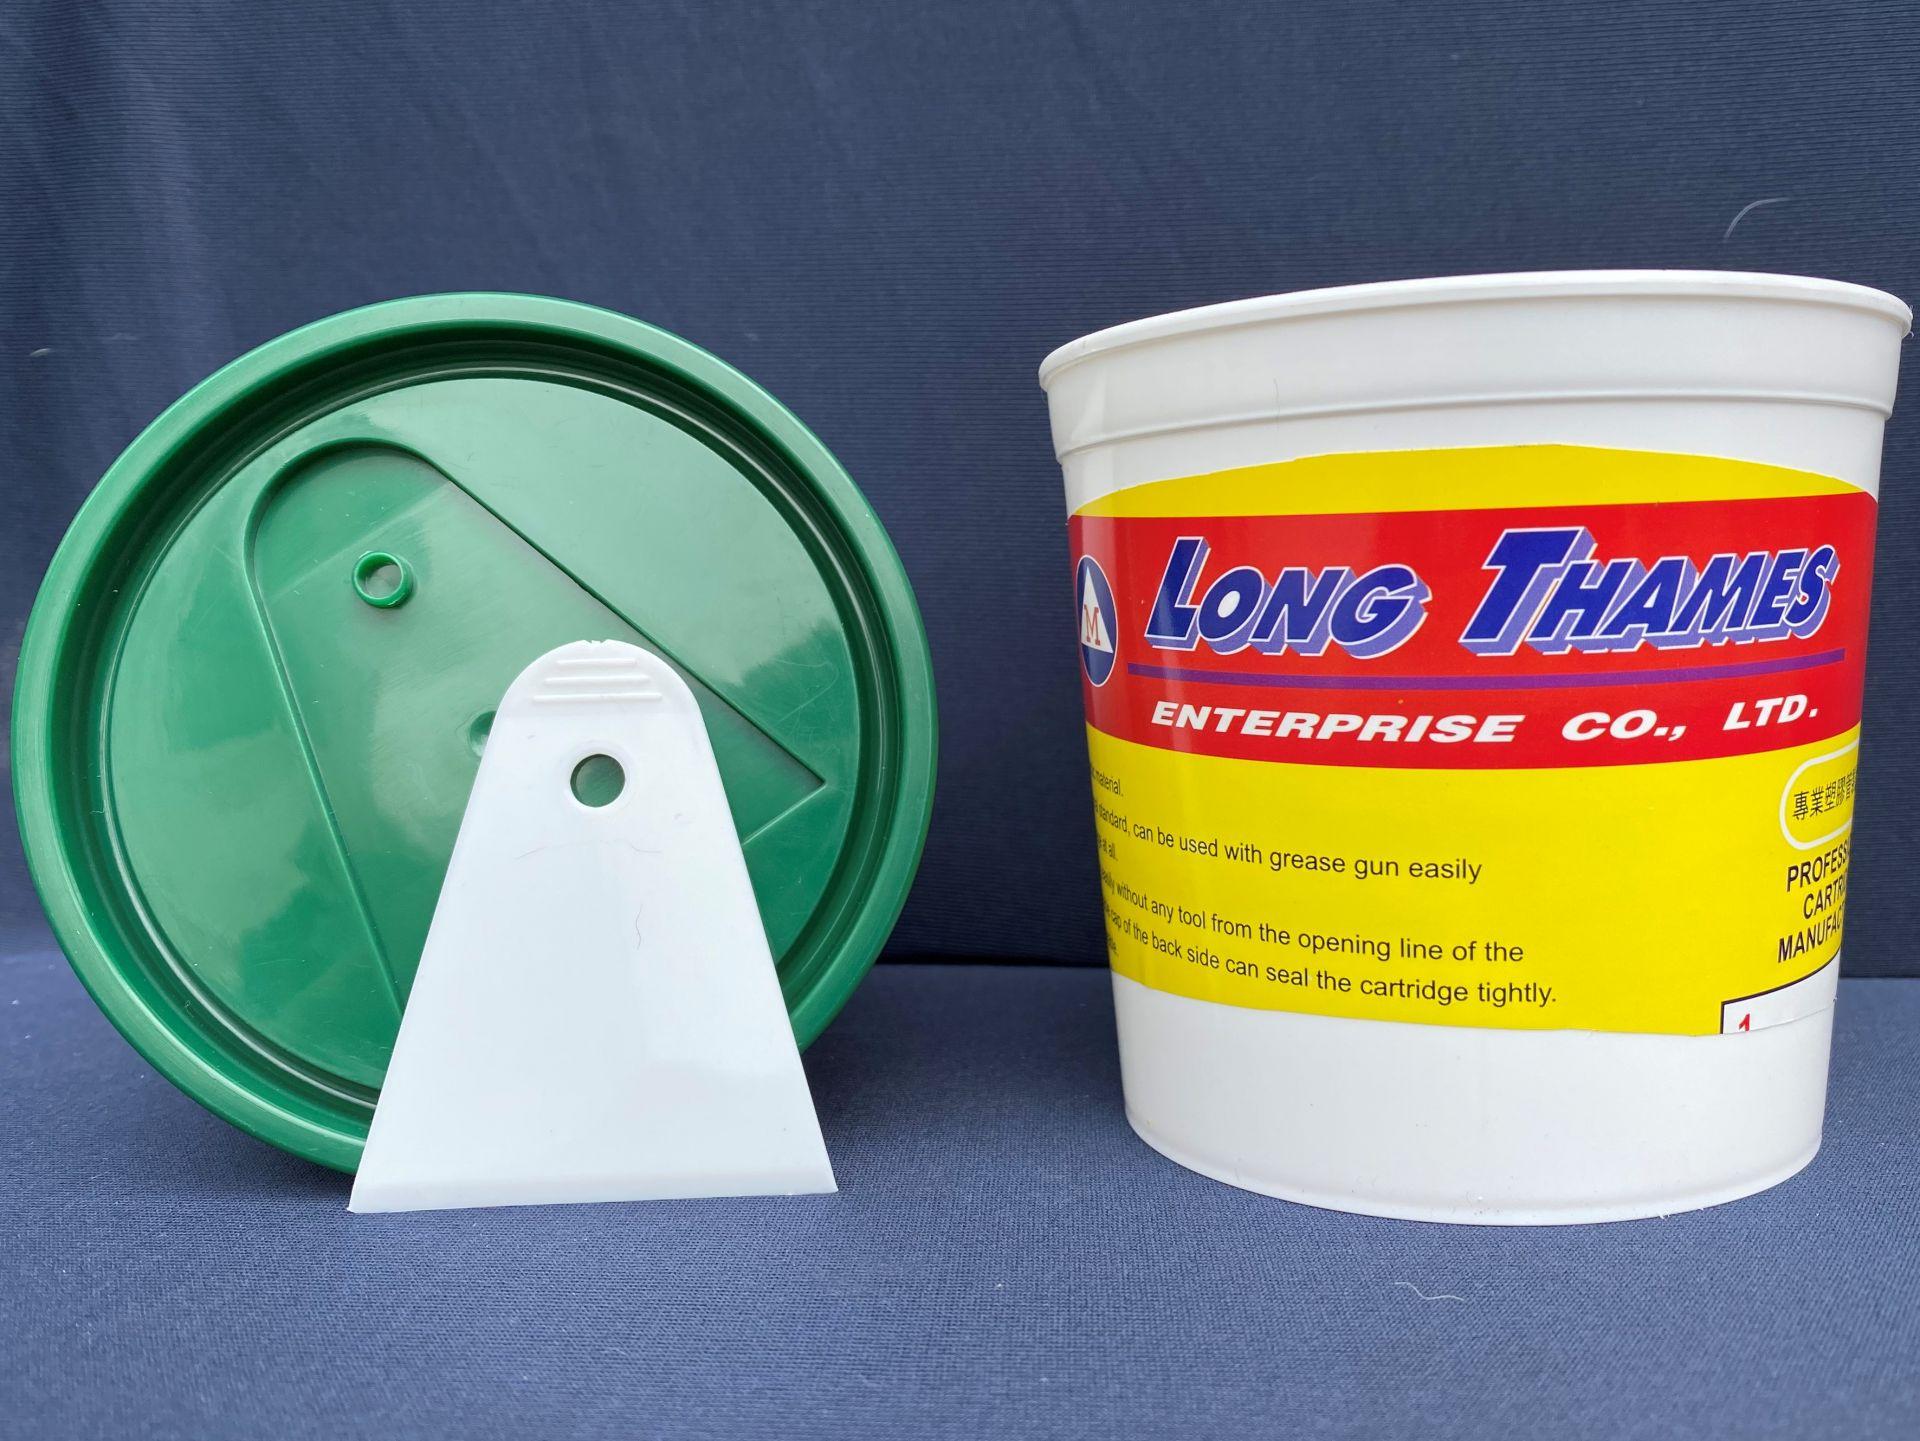 Volume : 600 ml / 0.6 L, HDPE, white crapper, green cap, white can